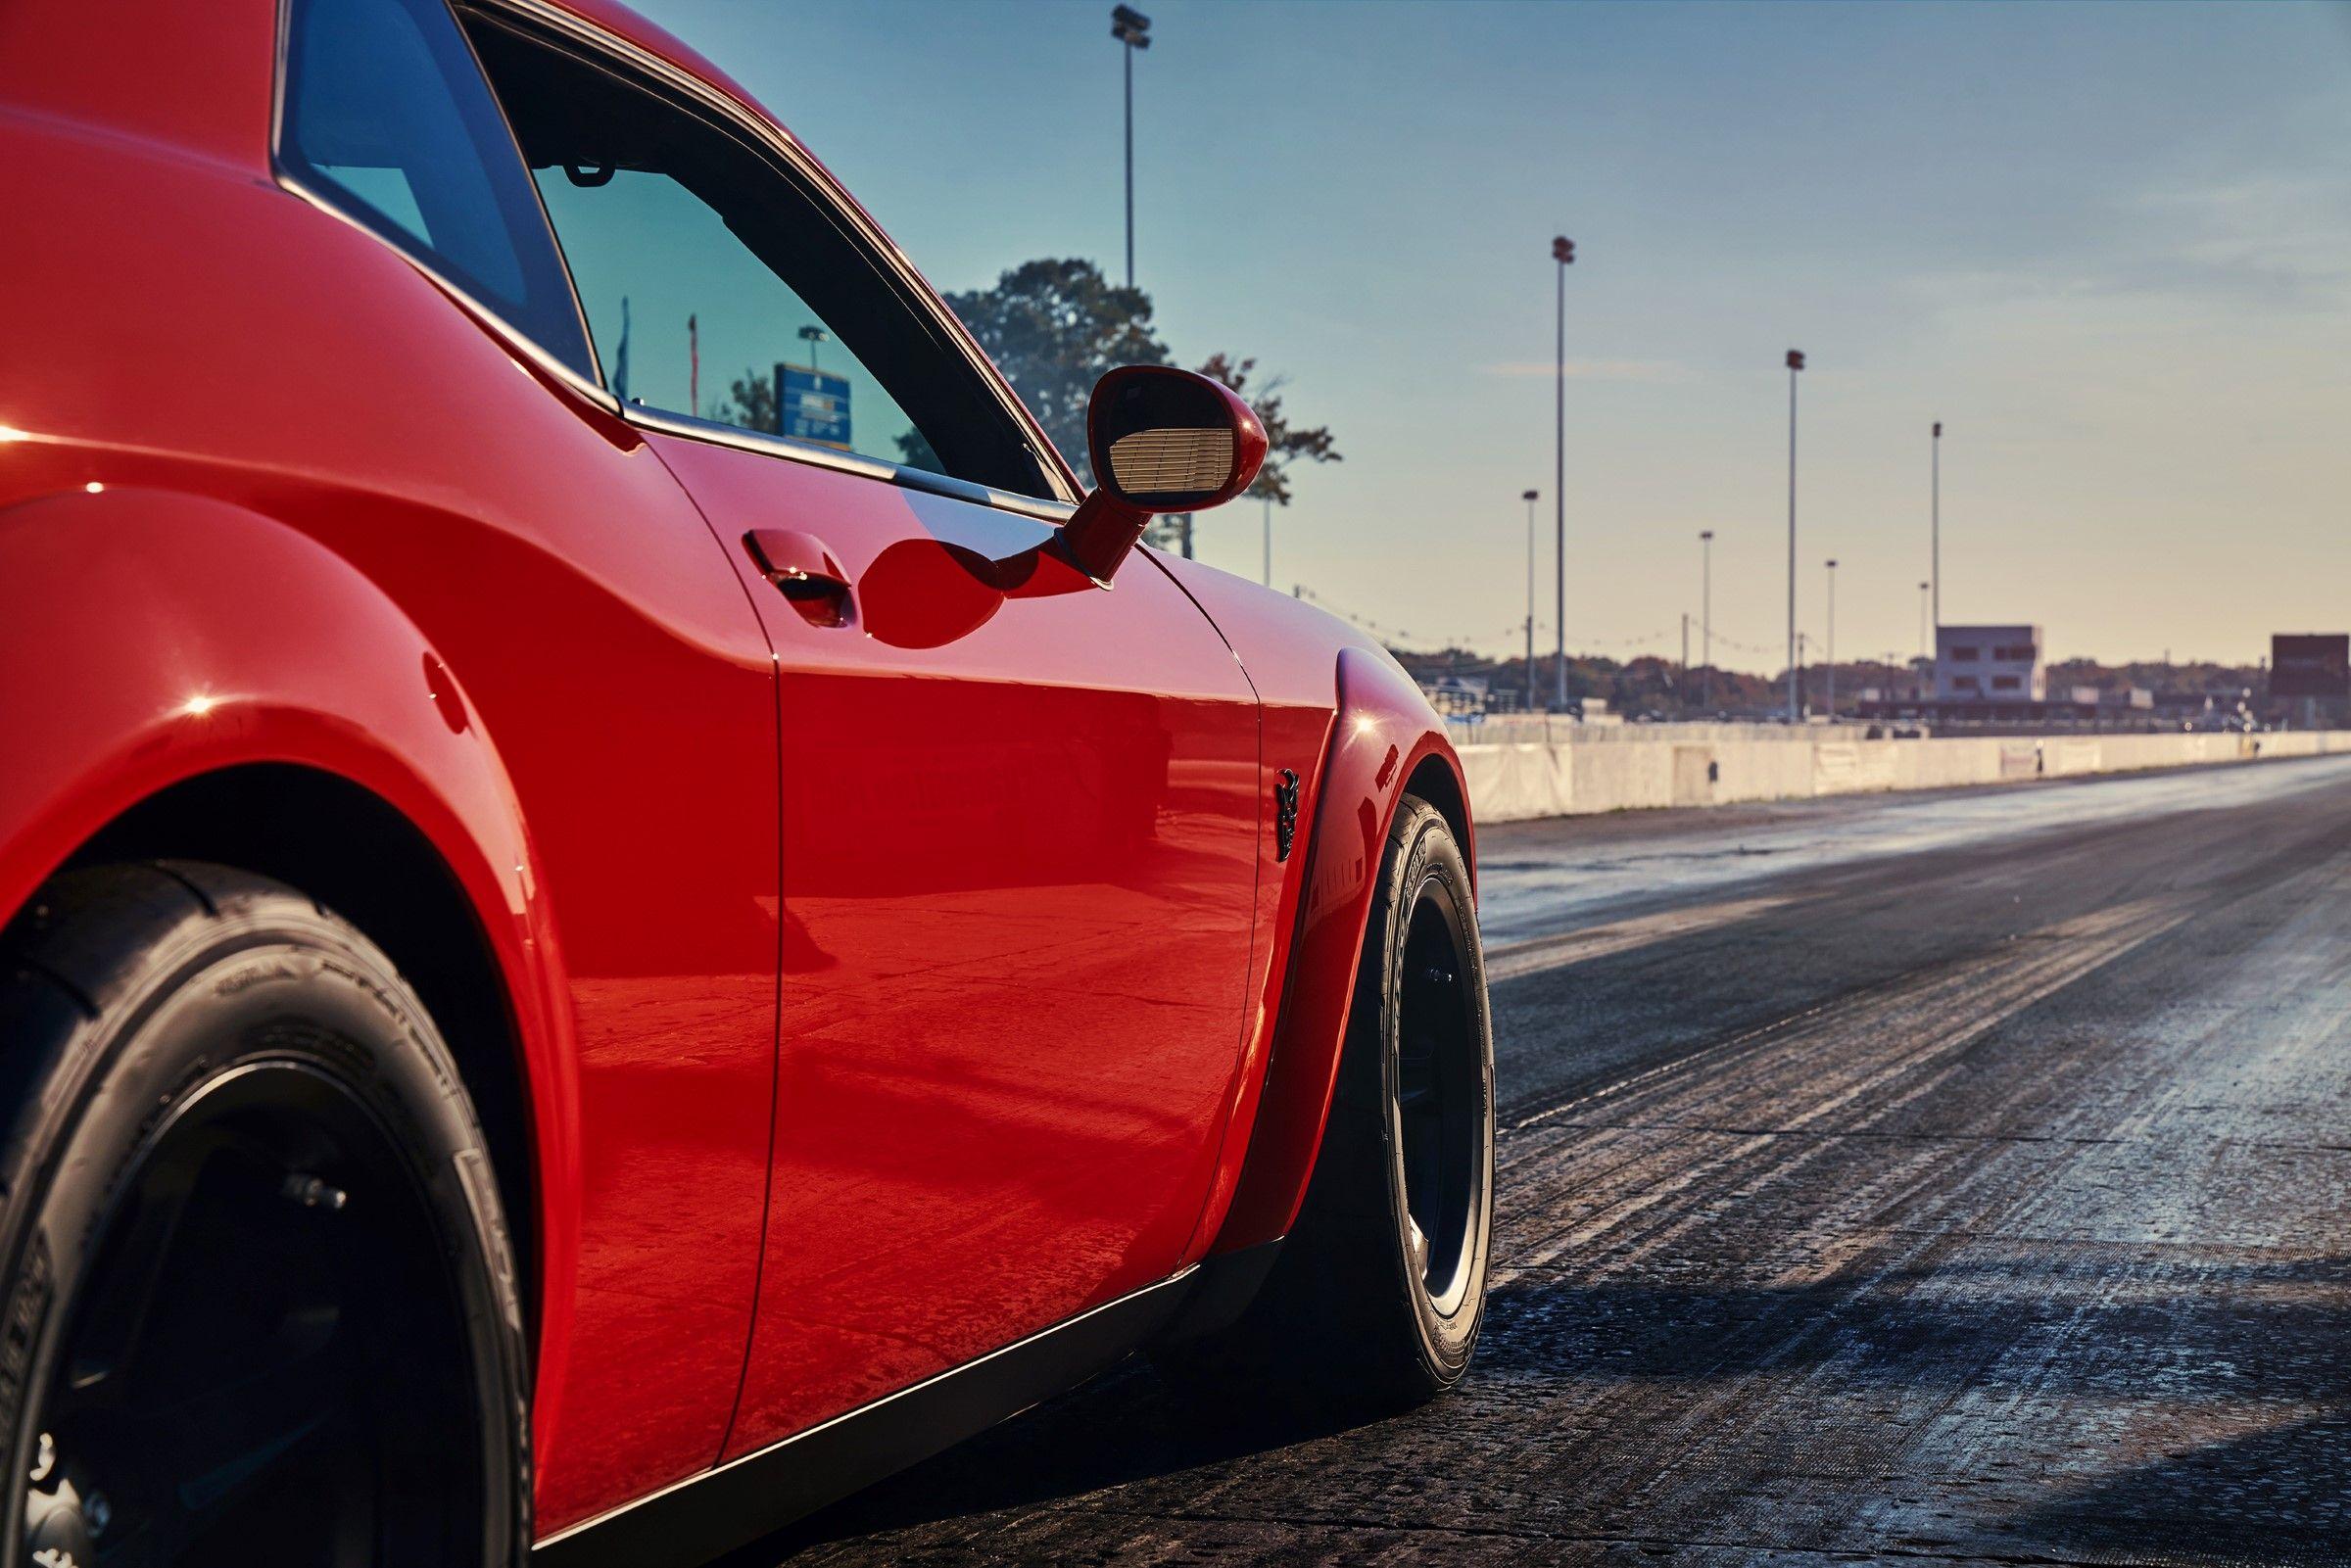 2018 dodge challenger srt demon 840 hp 770 torque 9 65 140 mph